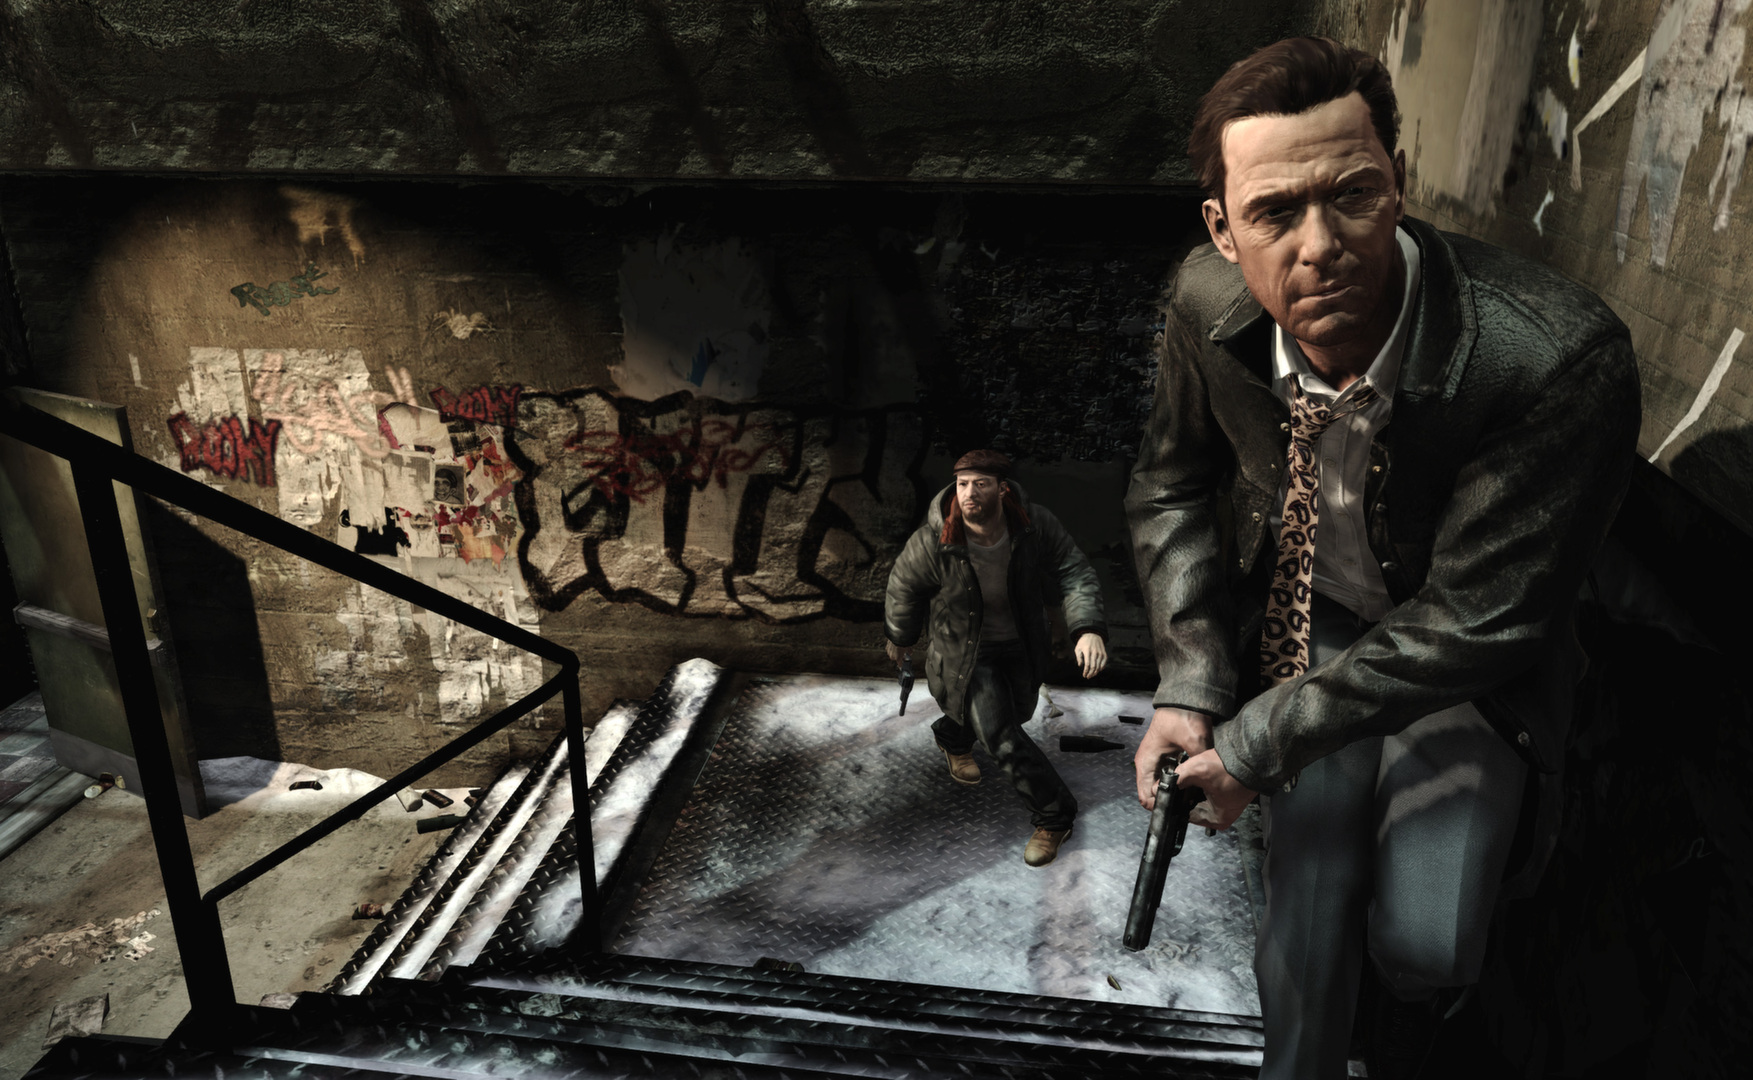 Secretly Play Max Payne 3 on Mac